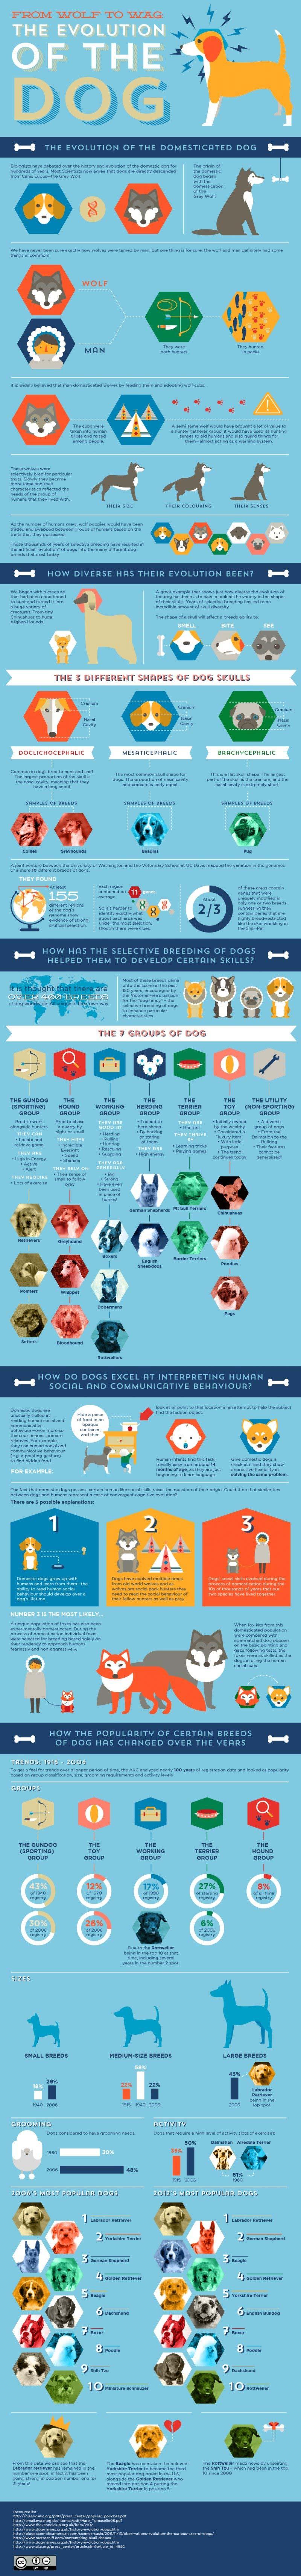 Domestic Dog Evolution-Infographic